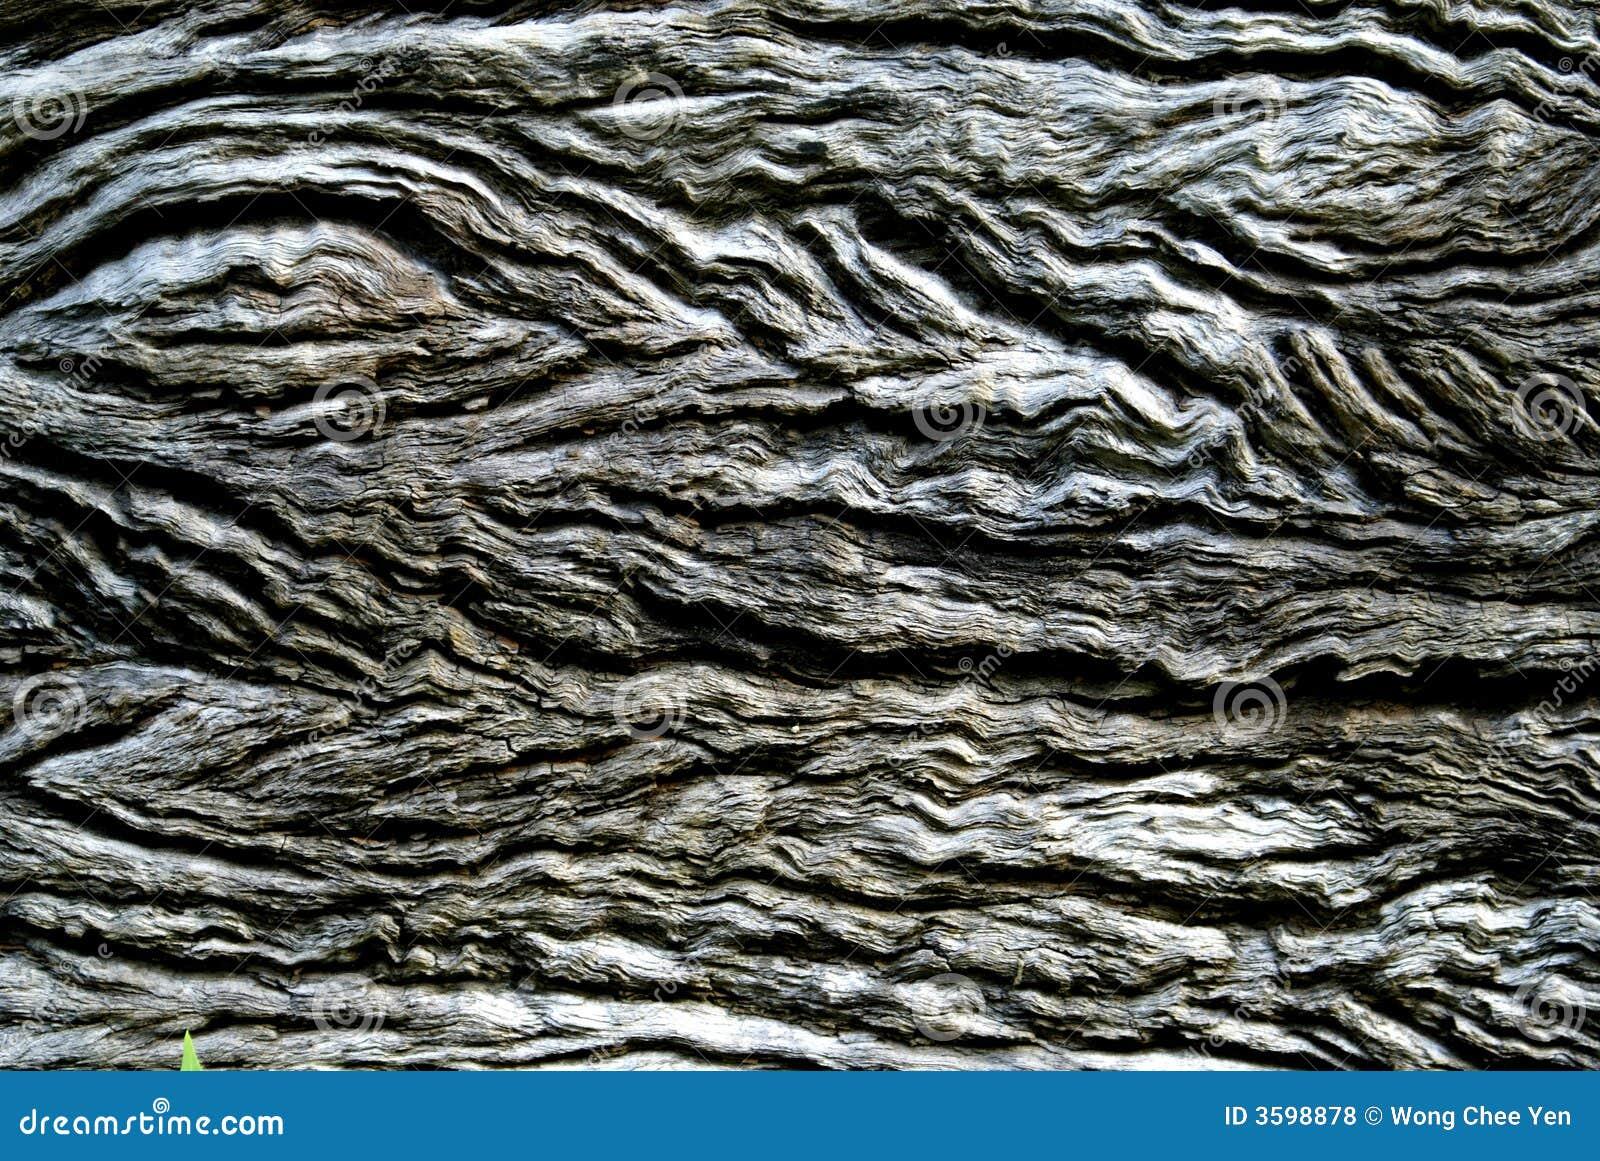 Rough Wood Texture Stock Photo Image Of Lines Retro